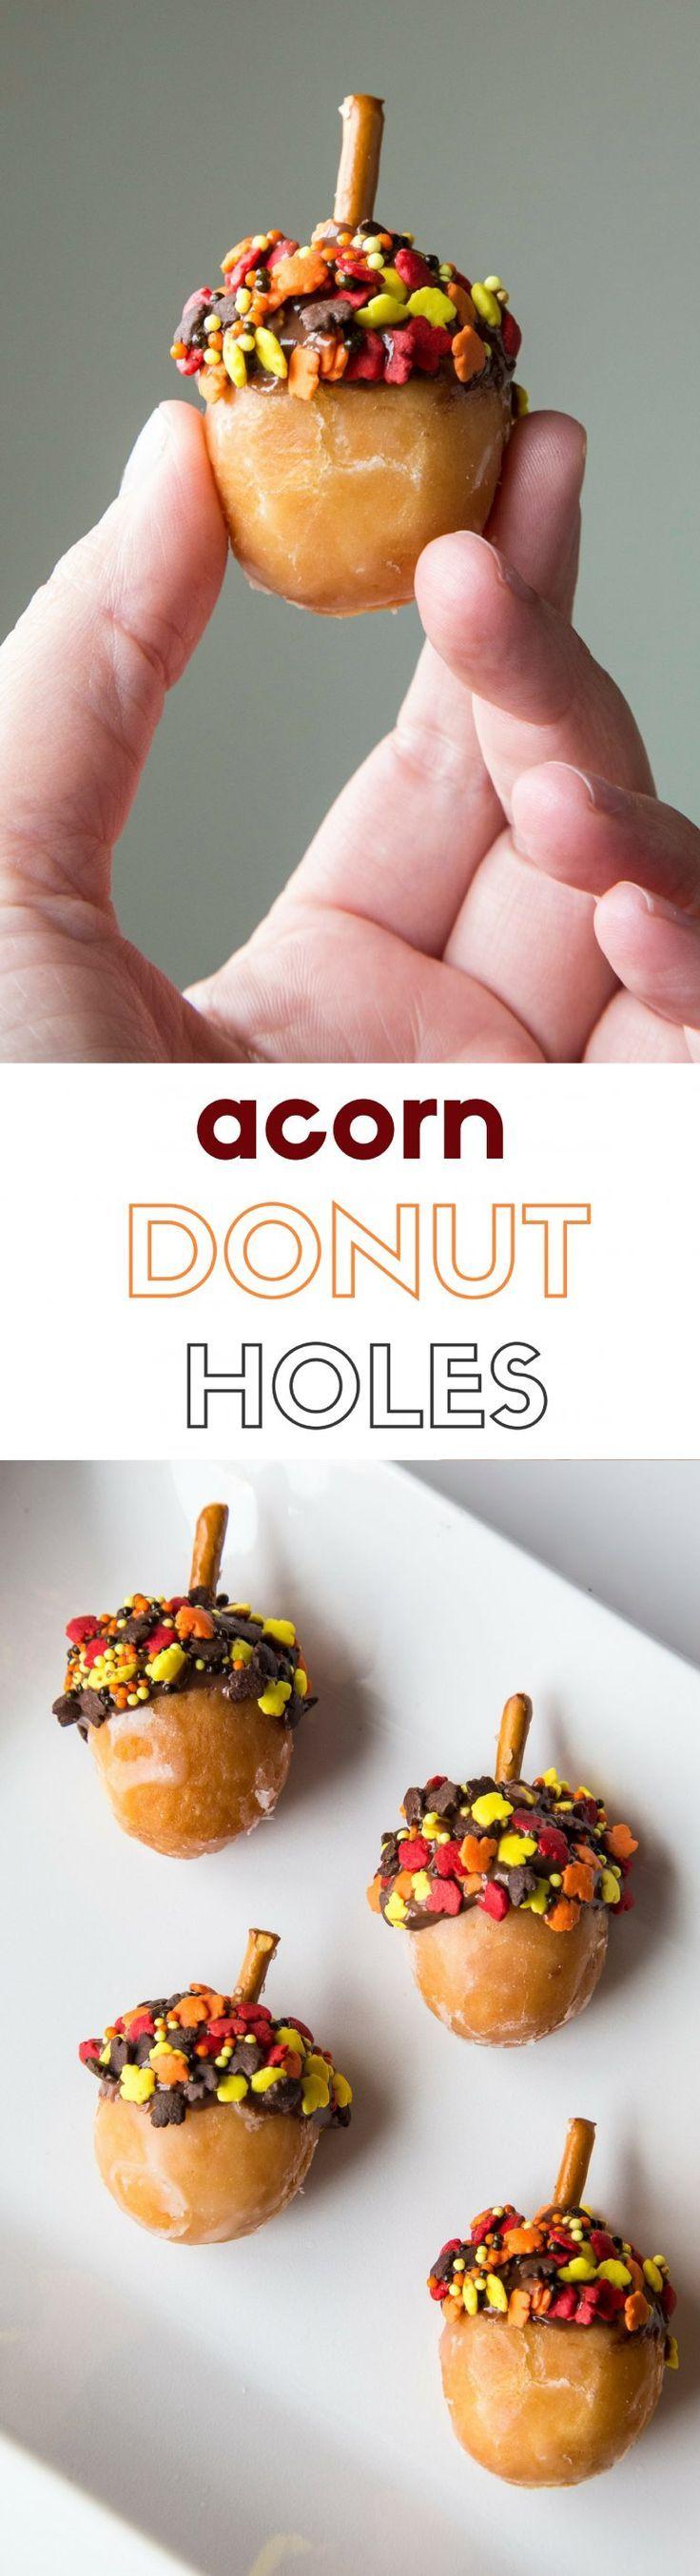 Acorn Donut Holes Recipe | Mom Spark - Mom Blogger